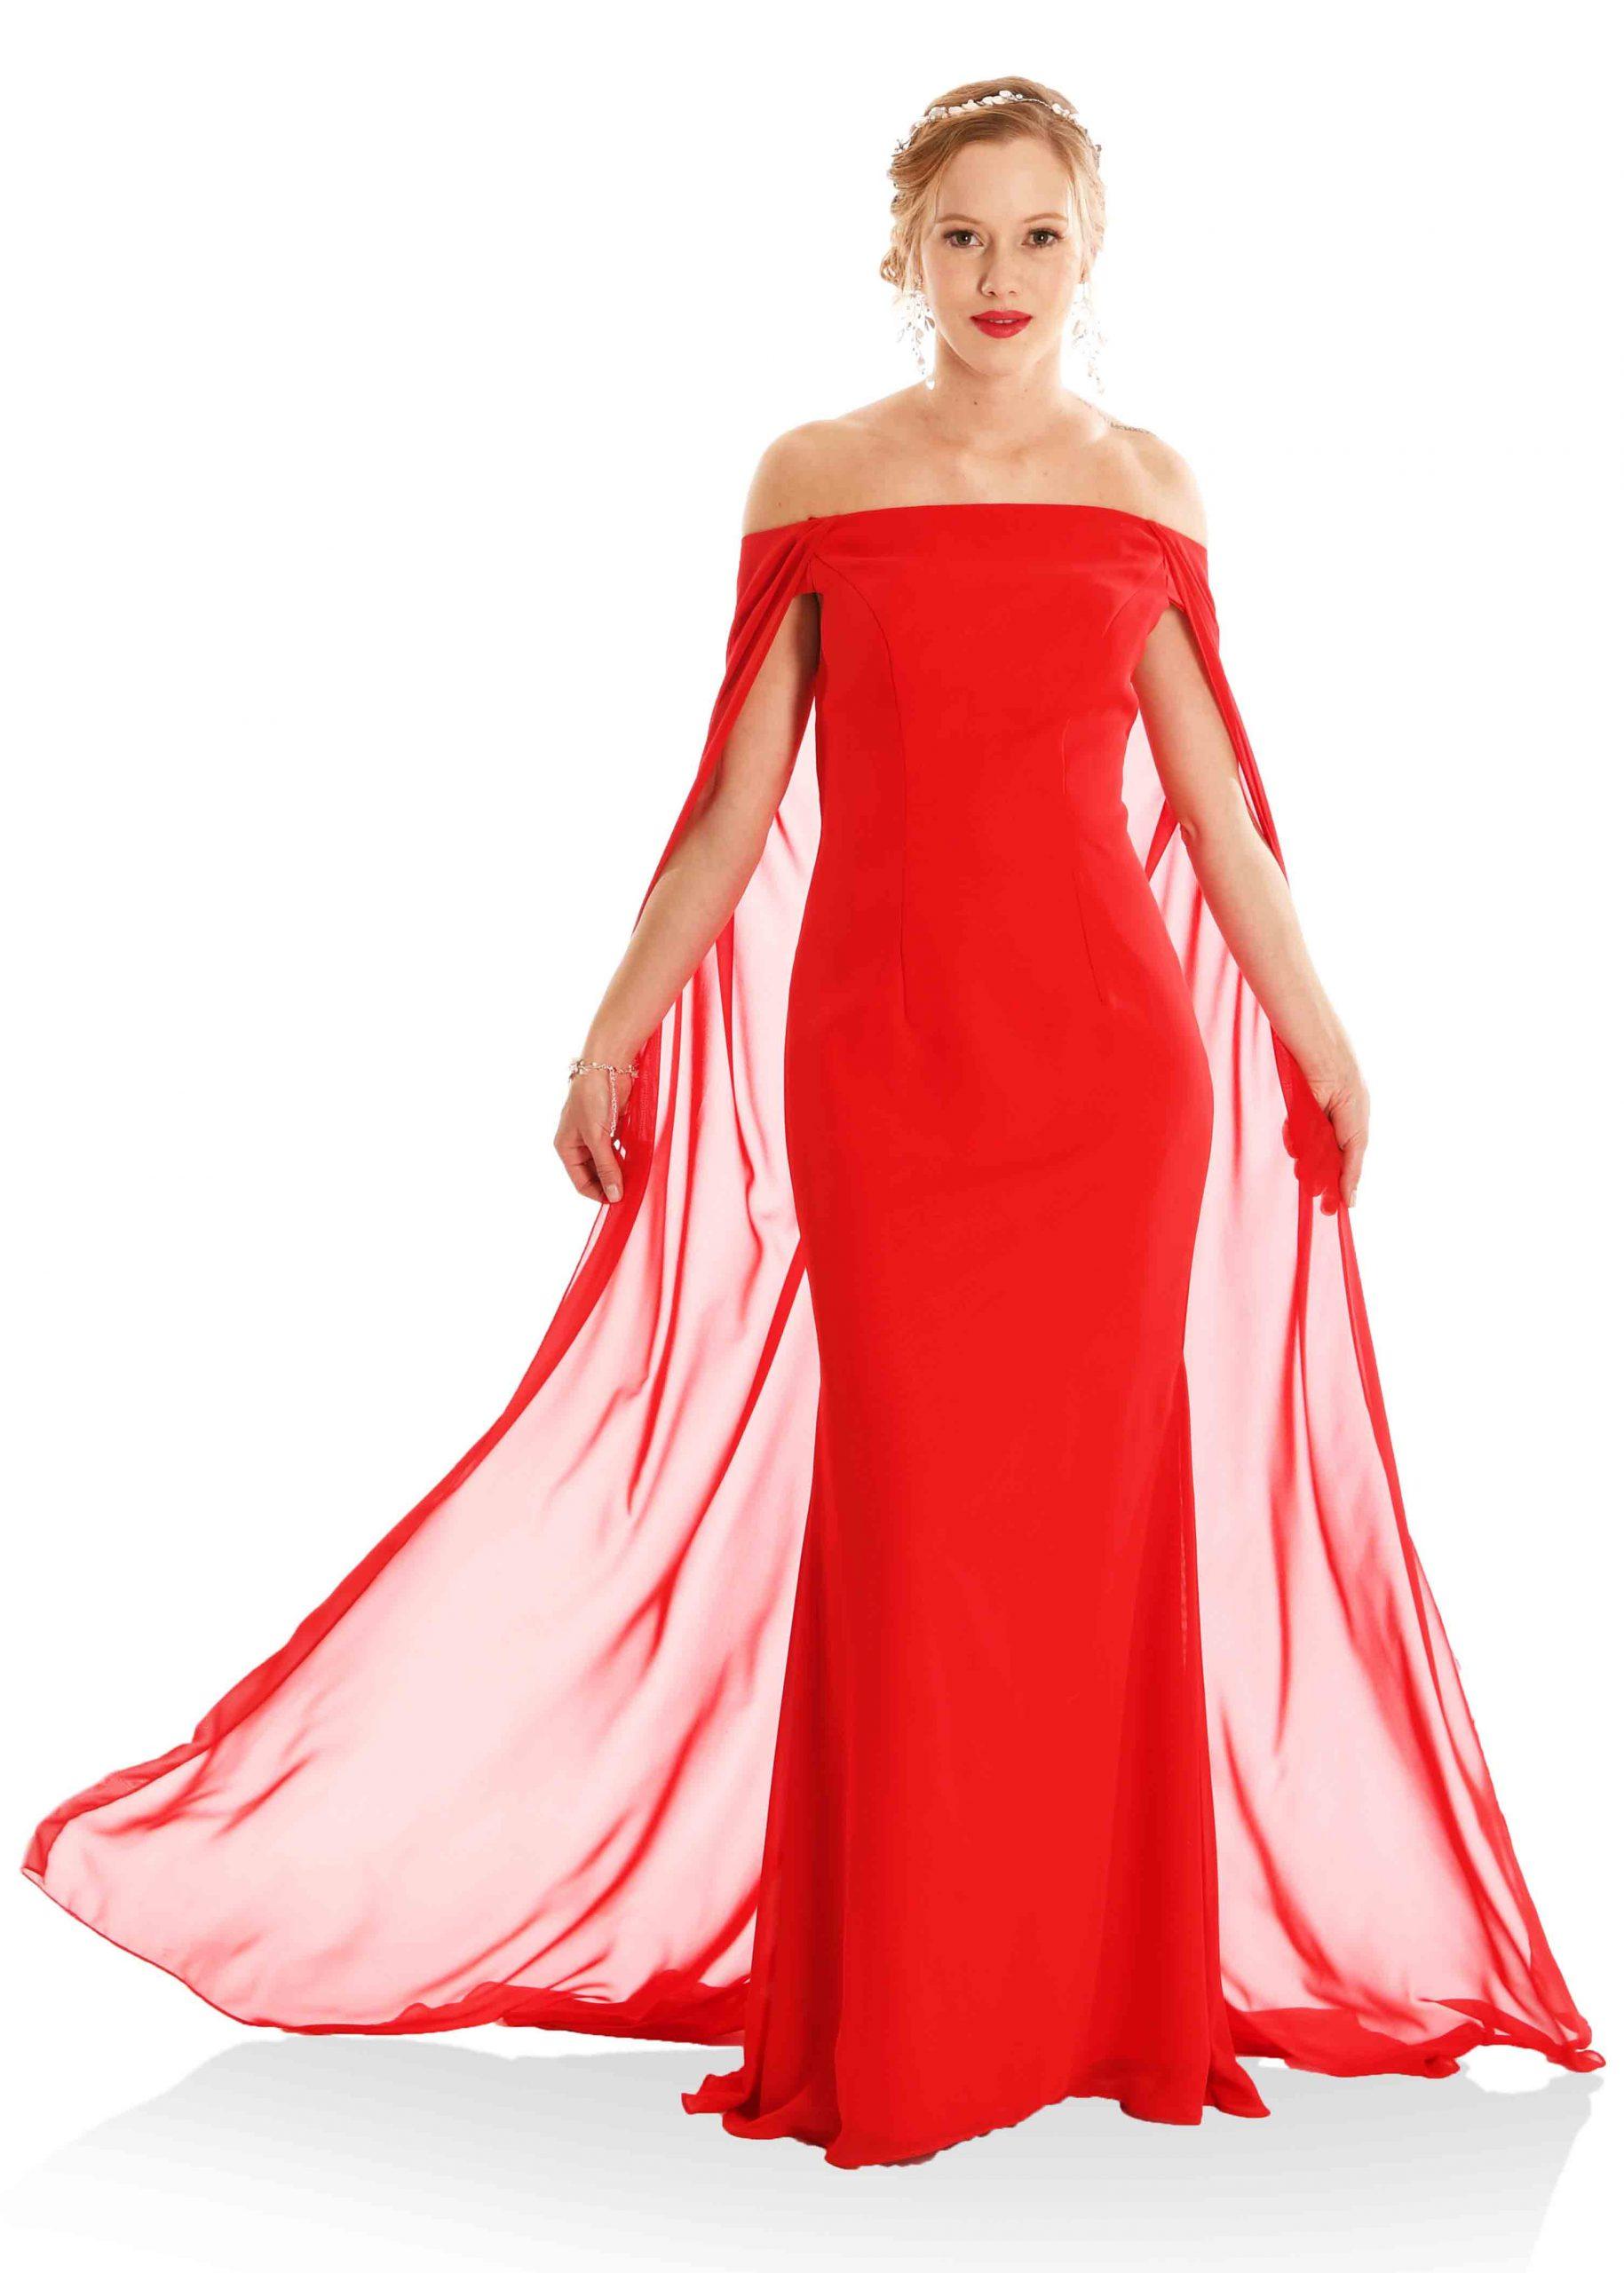 17 Genial Kleider Abendmode Ärmel17 Elegant Kleider Abendmode Bester Preis